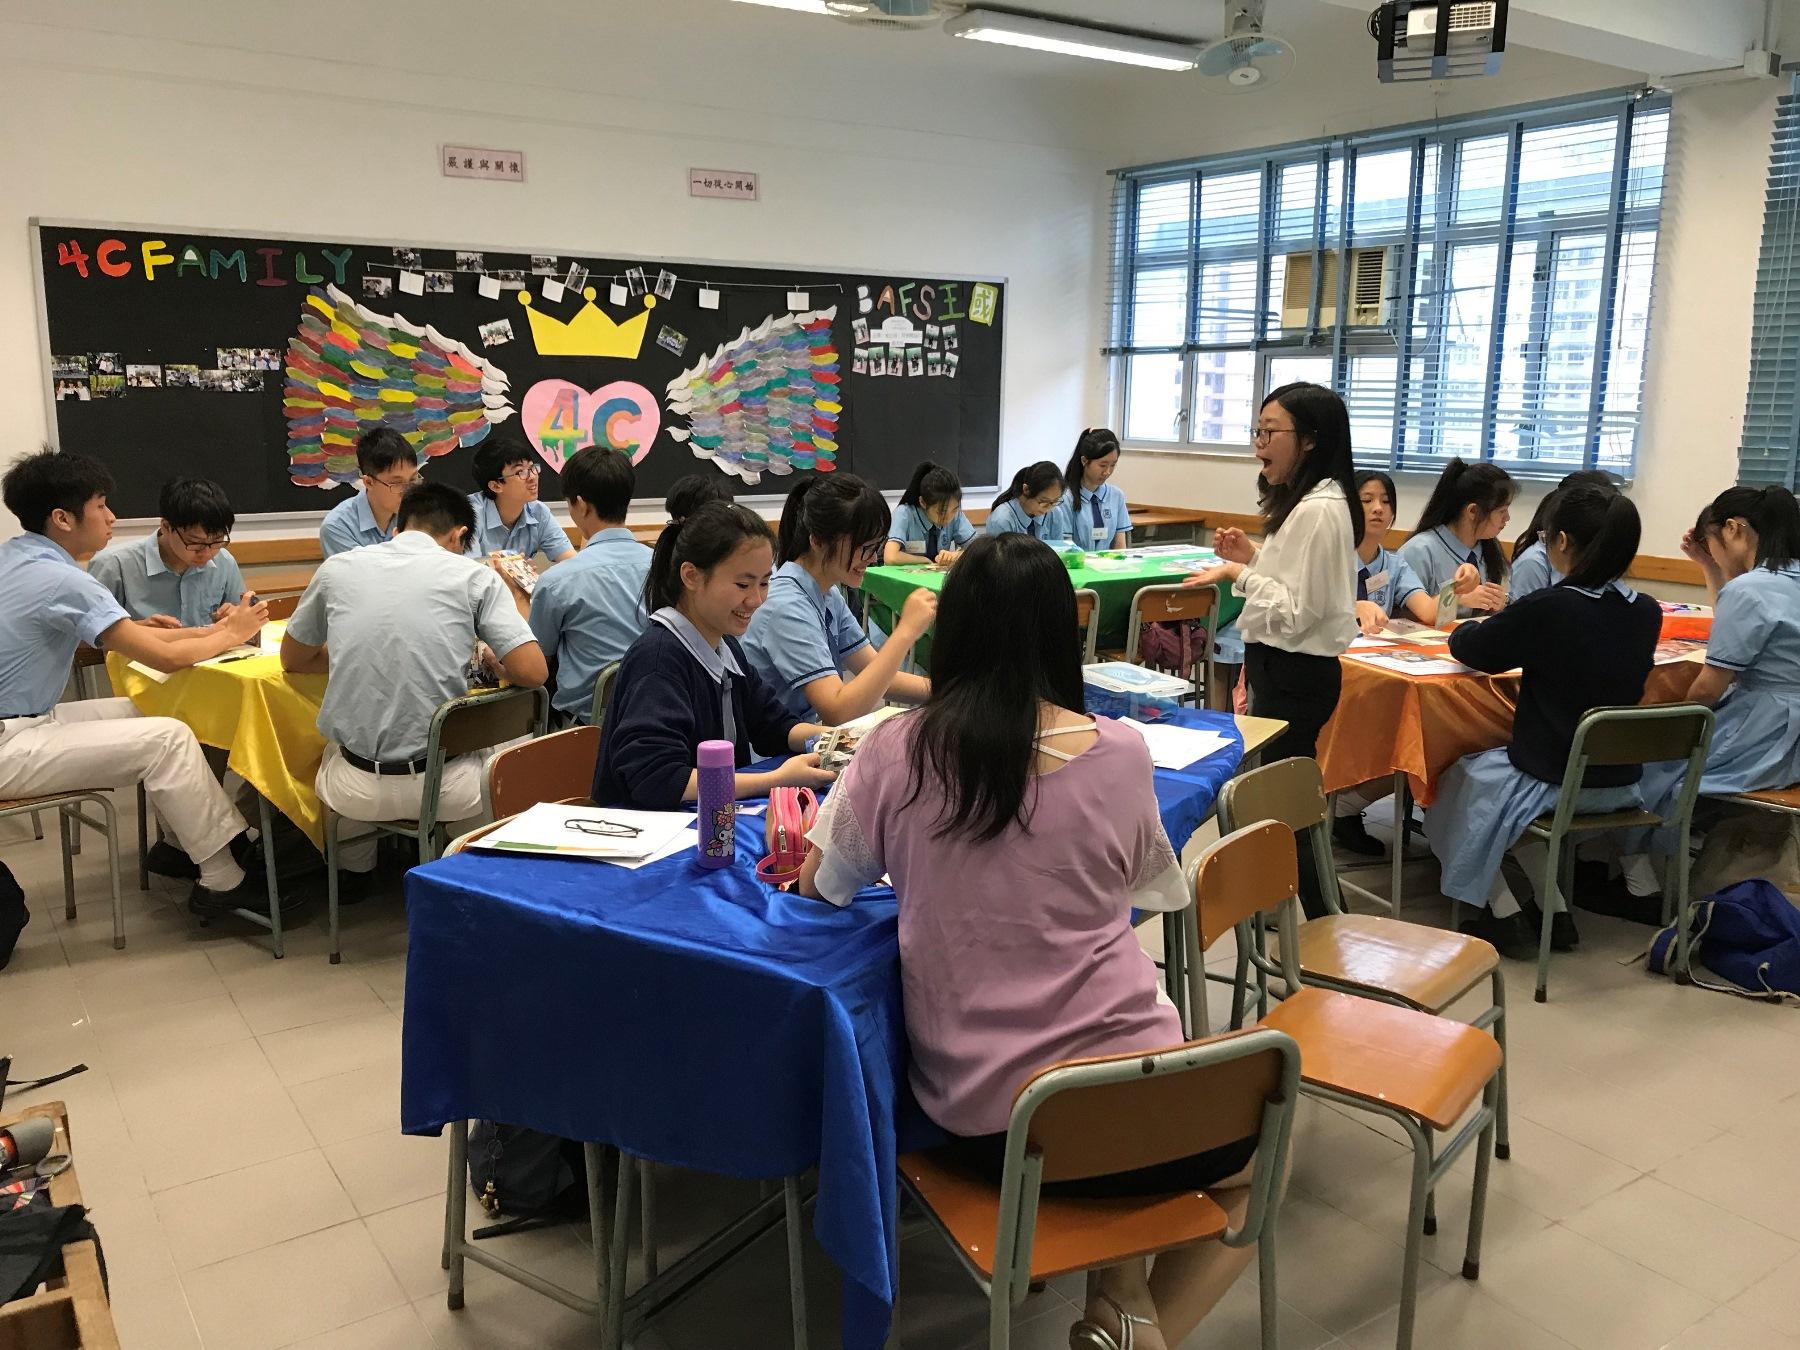 http://npc.edu.hk/sites/default/files/img_4340.jpg